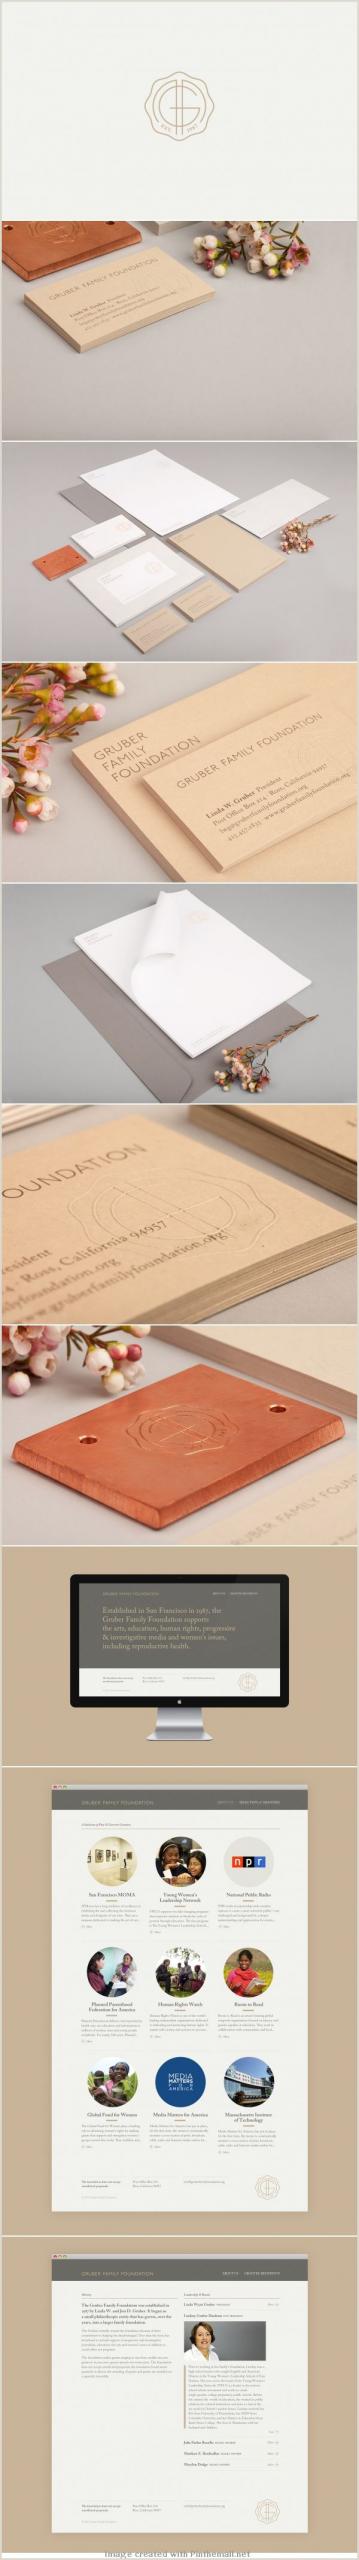 Simple Business Card Design 14 Popular Hardwood Flooring Business Card Template